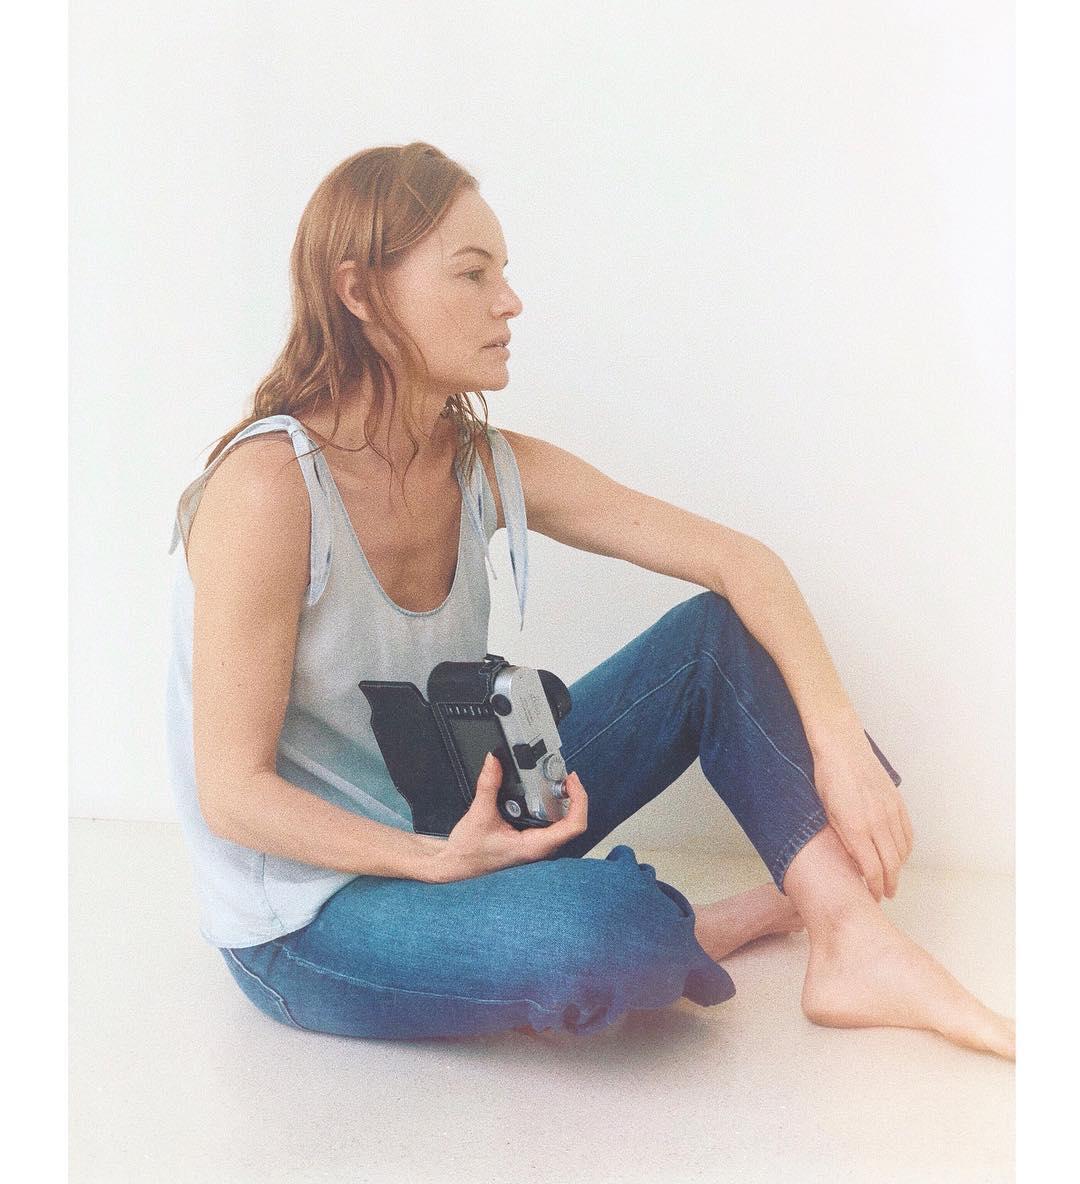 Кейт Босуорт: #bts of the girl behind the camera   @jbrandjeans #ComingSoon